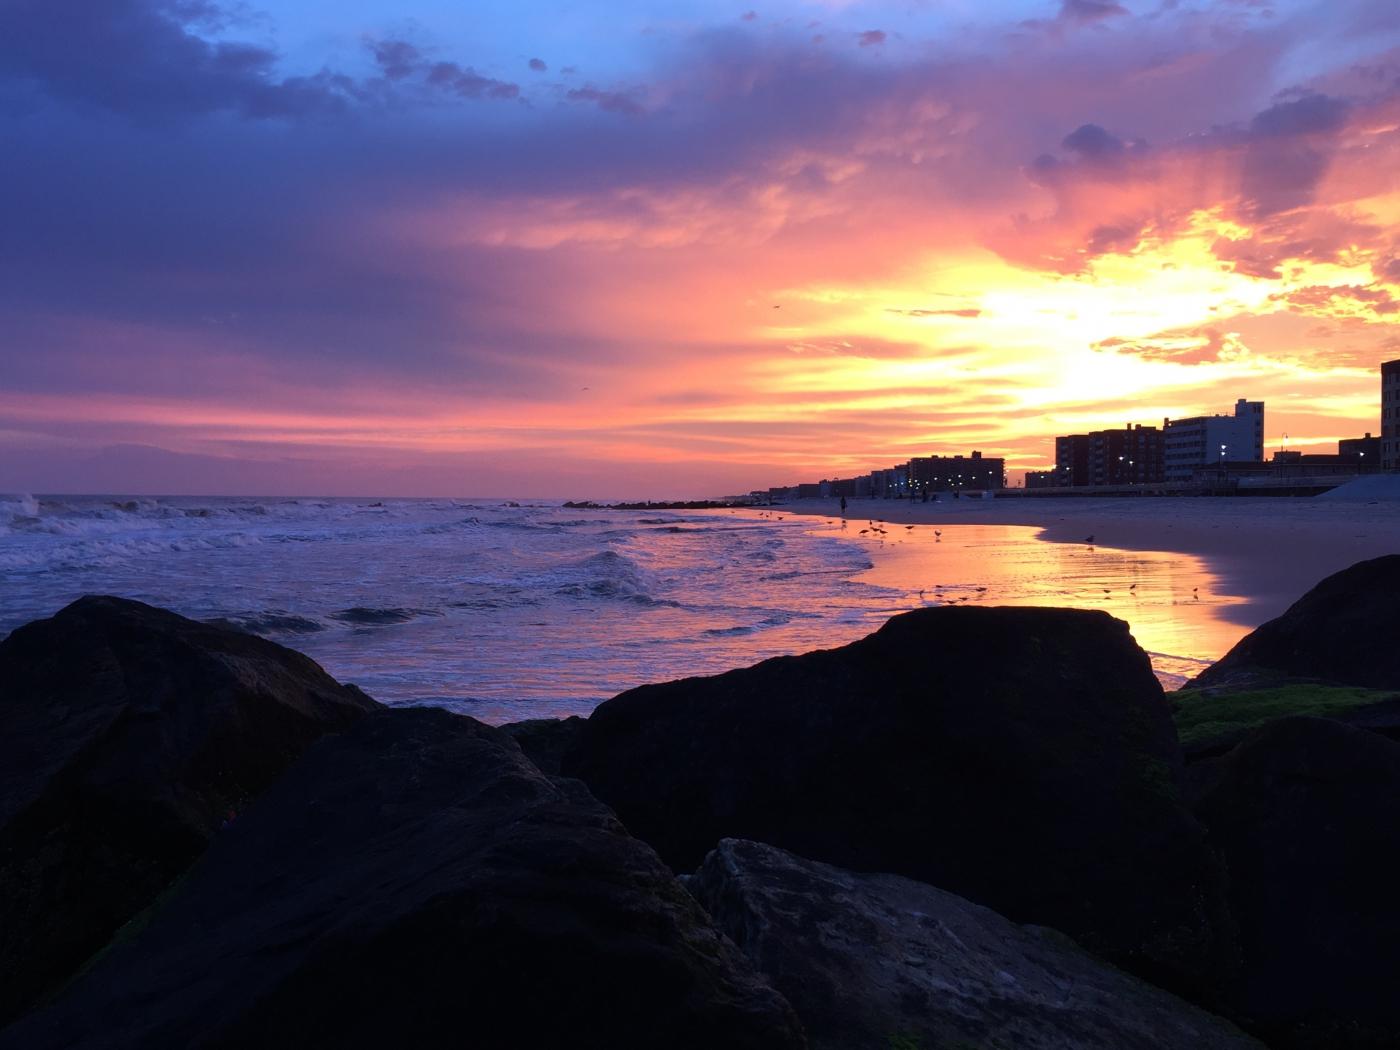 Long Beach 铺天盖地的晚霞(手机)_图1-17